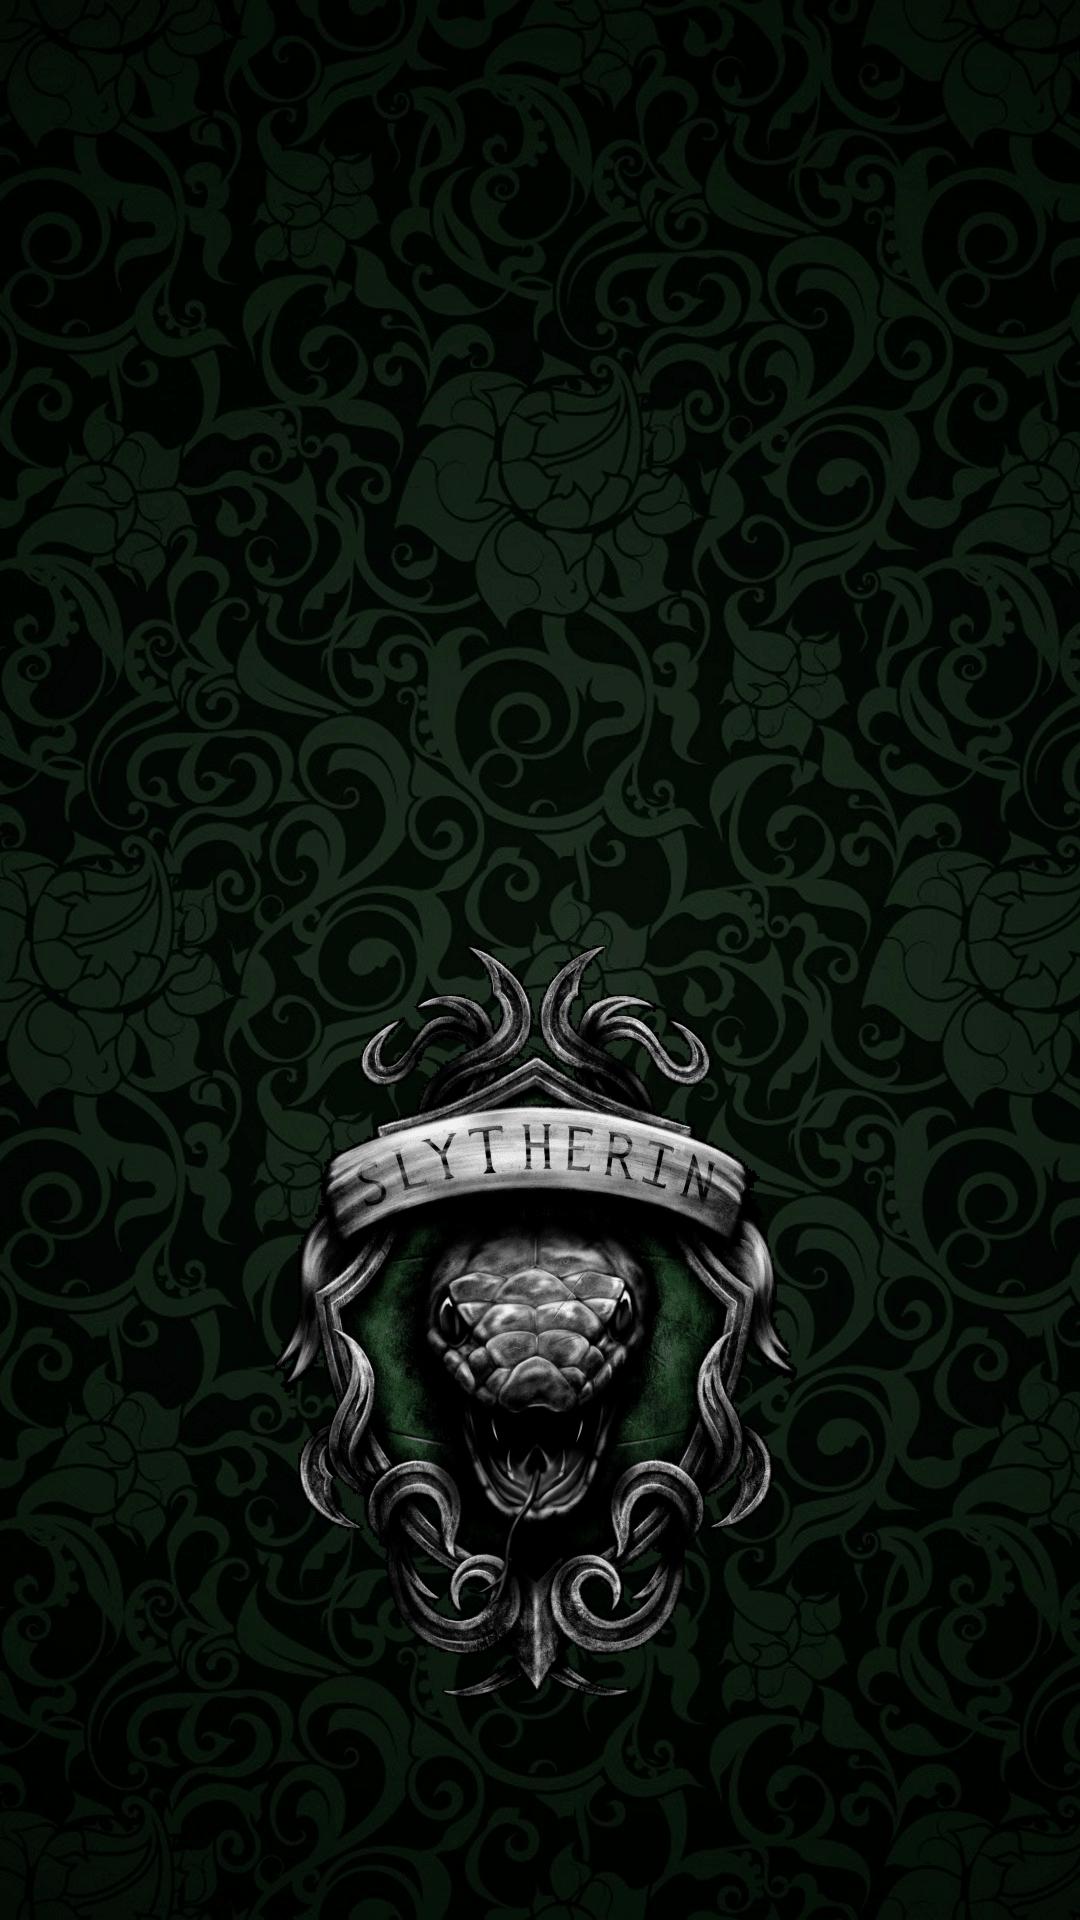 Slytherin Wallpaper   EnJpg 1080x1920